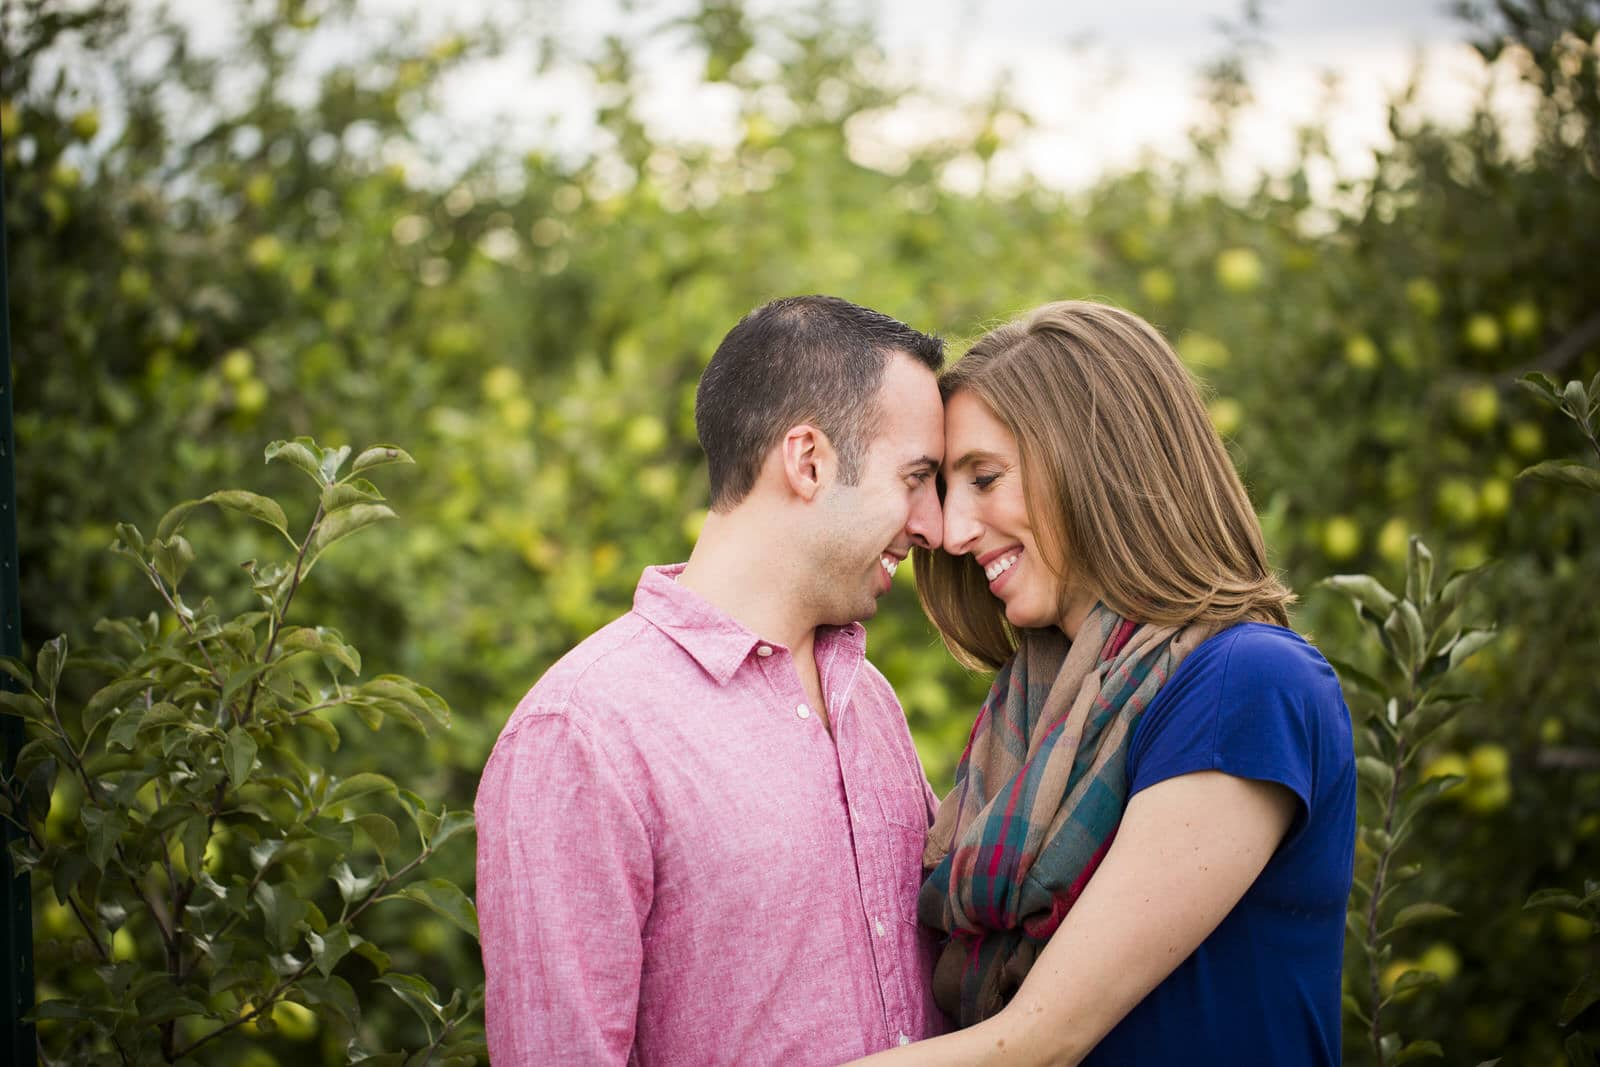 Leslie-Matt-Columbus-Ohio-engagement-photography-by-Amy-Ann-00009